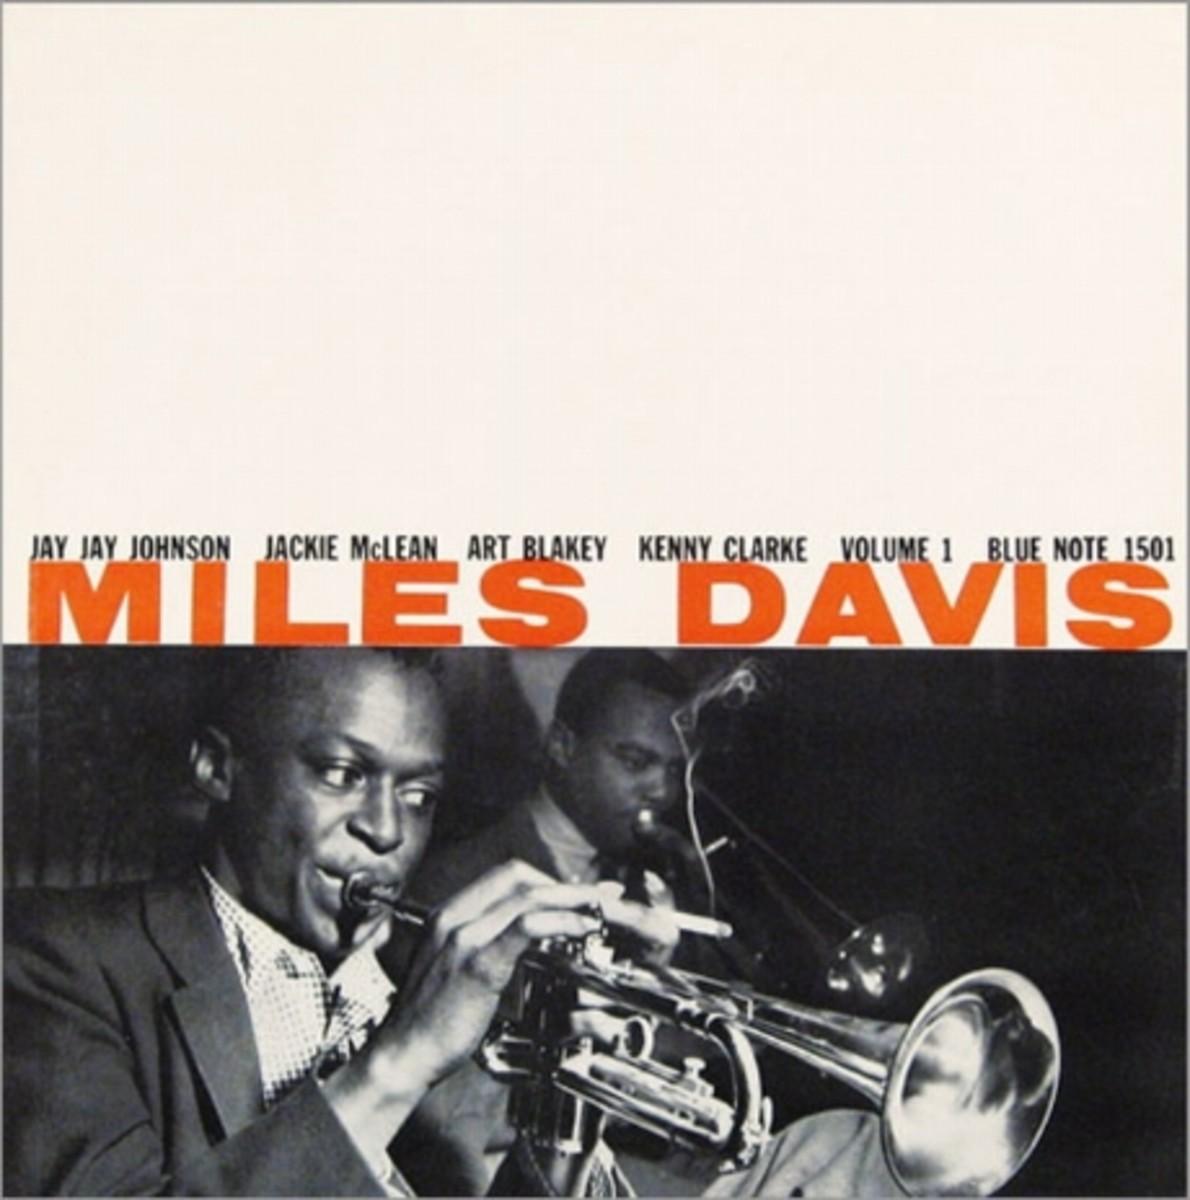 "Miles Davis, vol. 1 Blue Note Records BLP 1501 12"" LP Vinyl Record (1955)  Album Cover Design by John Hermansader,  Photo by Francis Wolff"